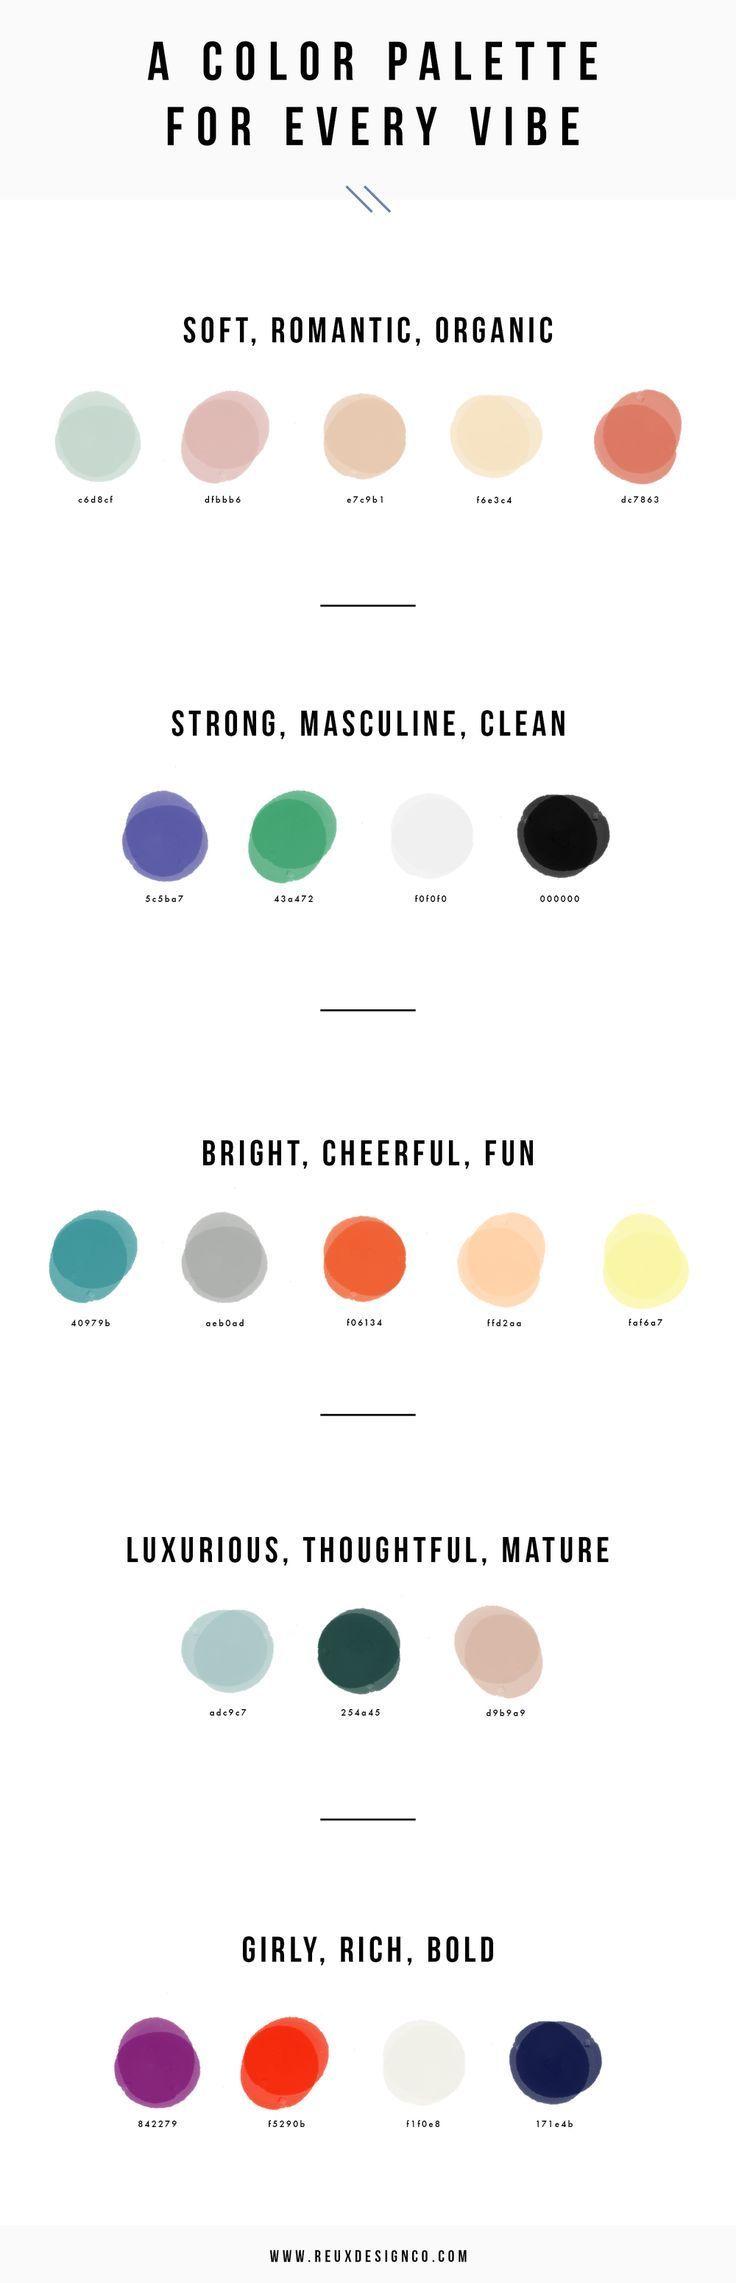 Color palette ideas   branding guide   Defining a …